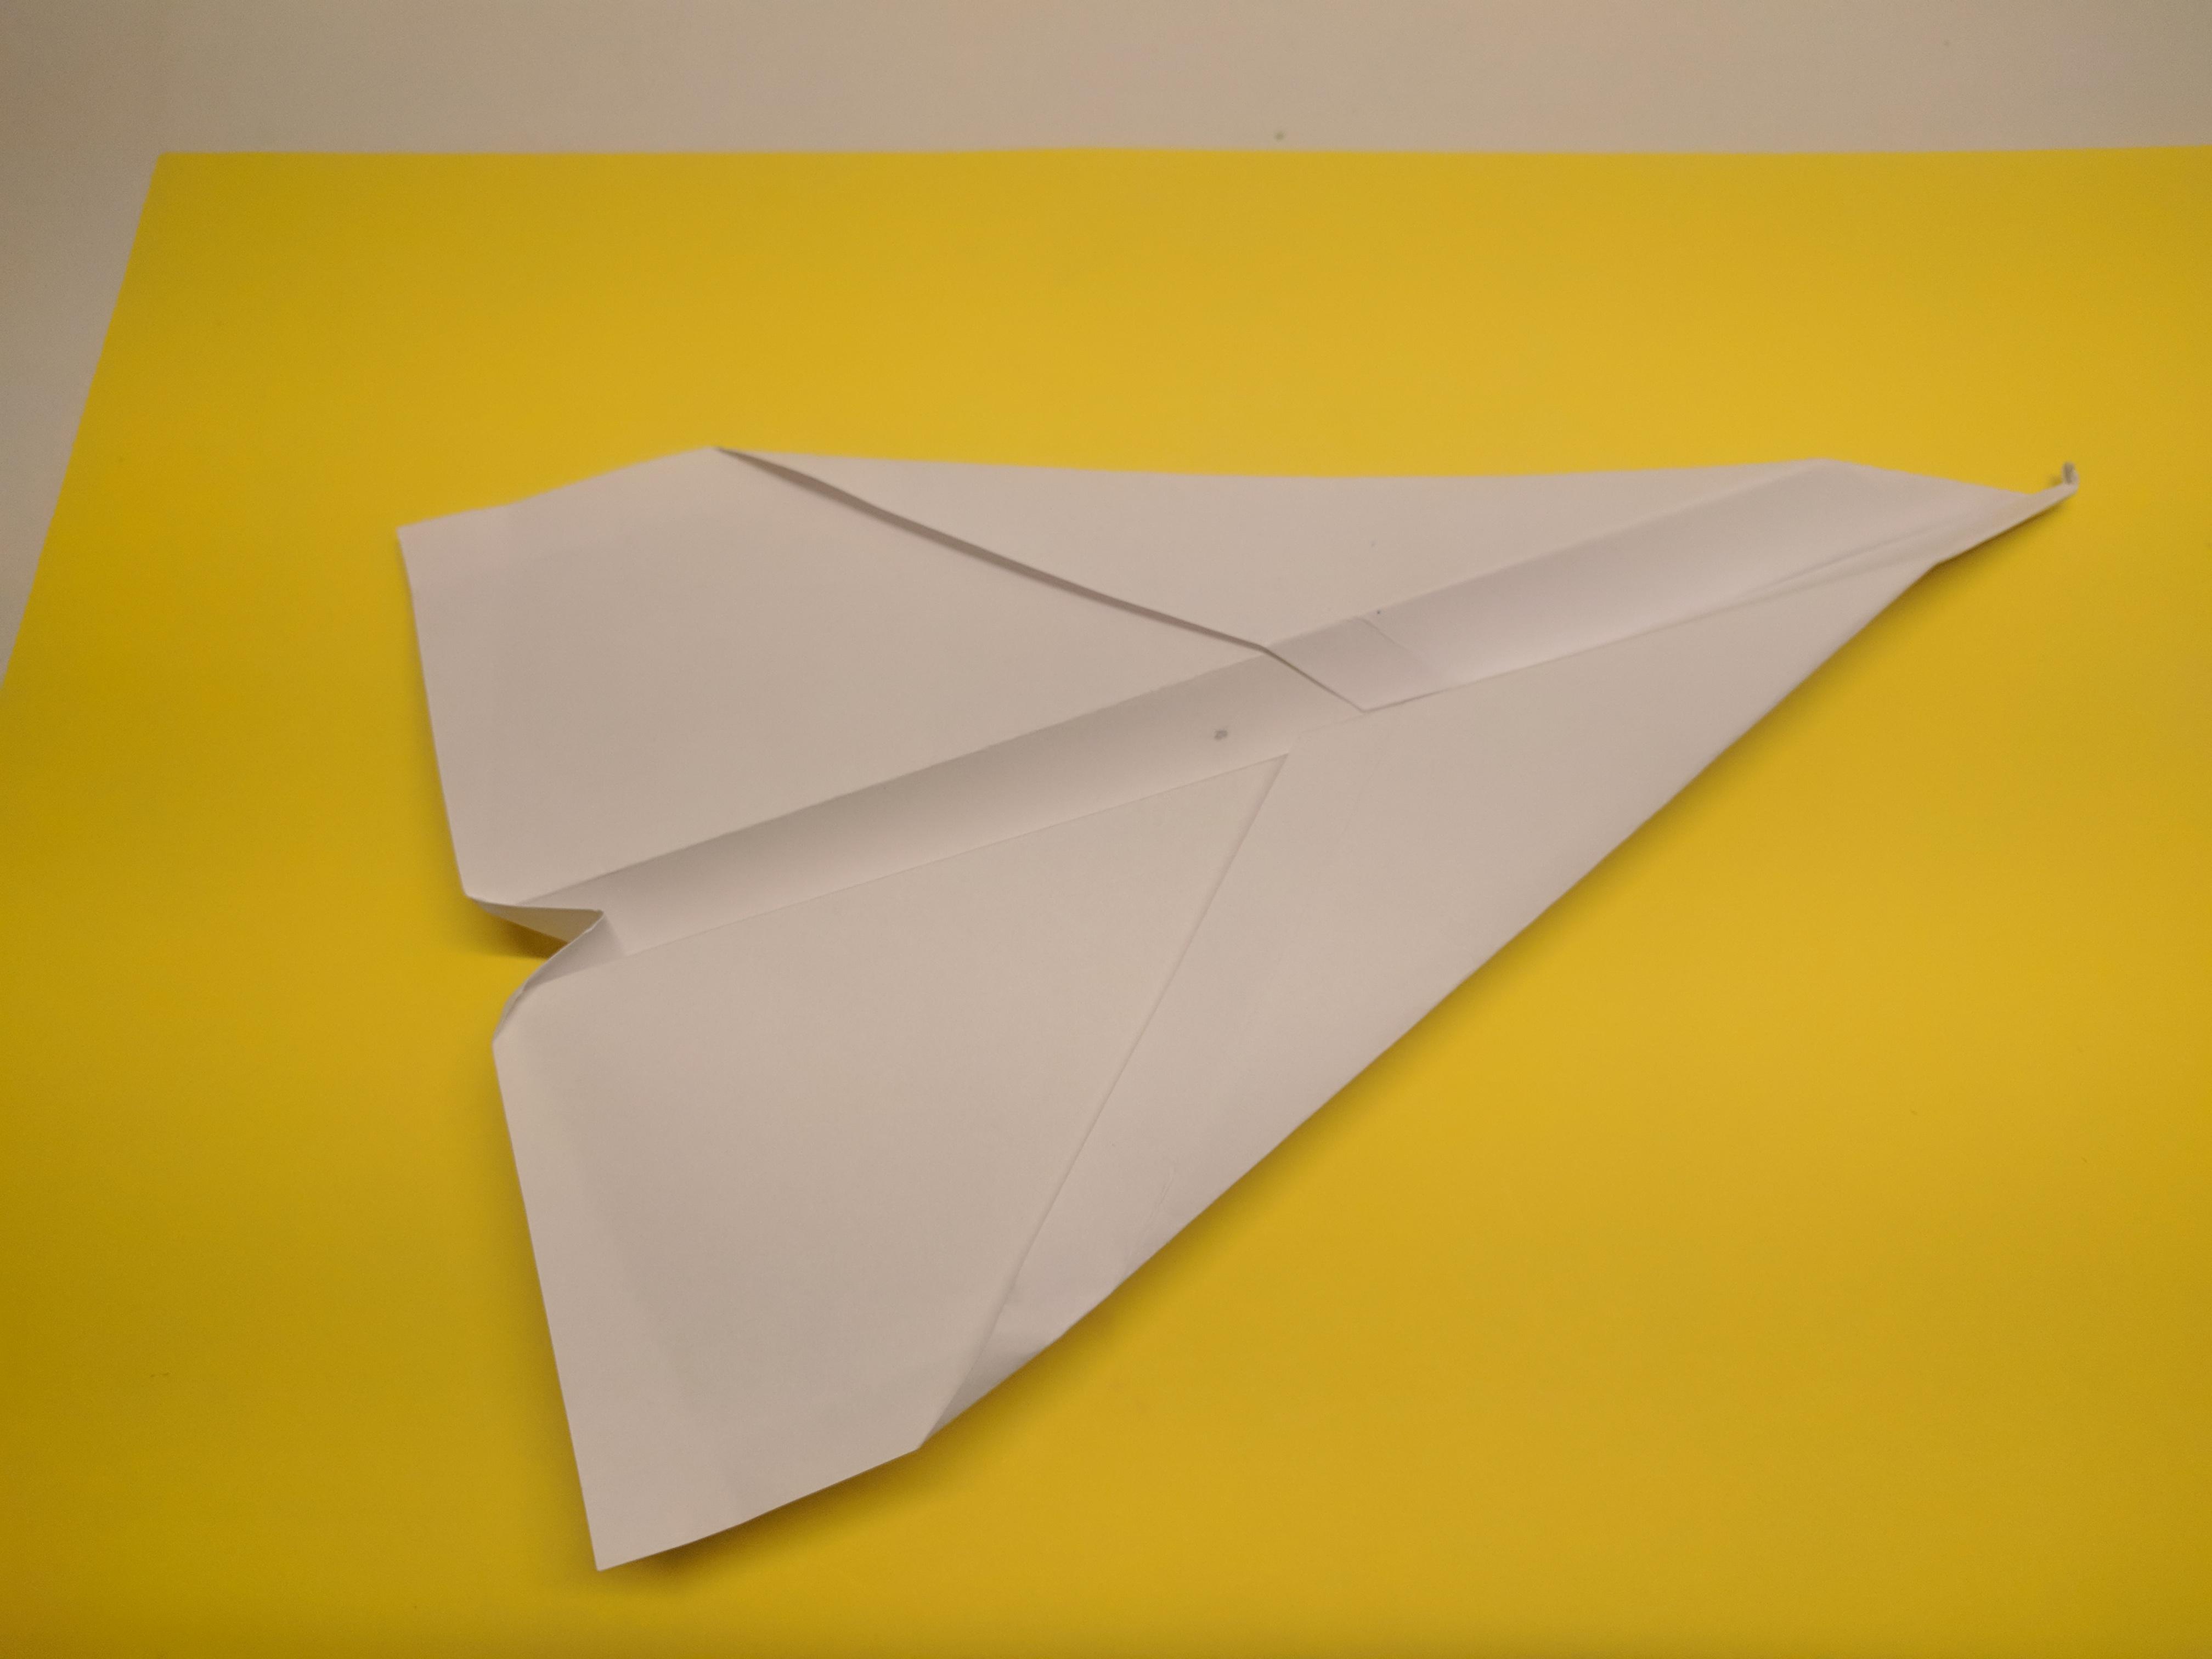 Hoe werkt: papieren vliegtuigje vouwen